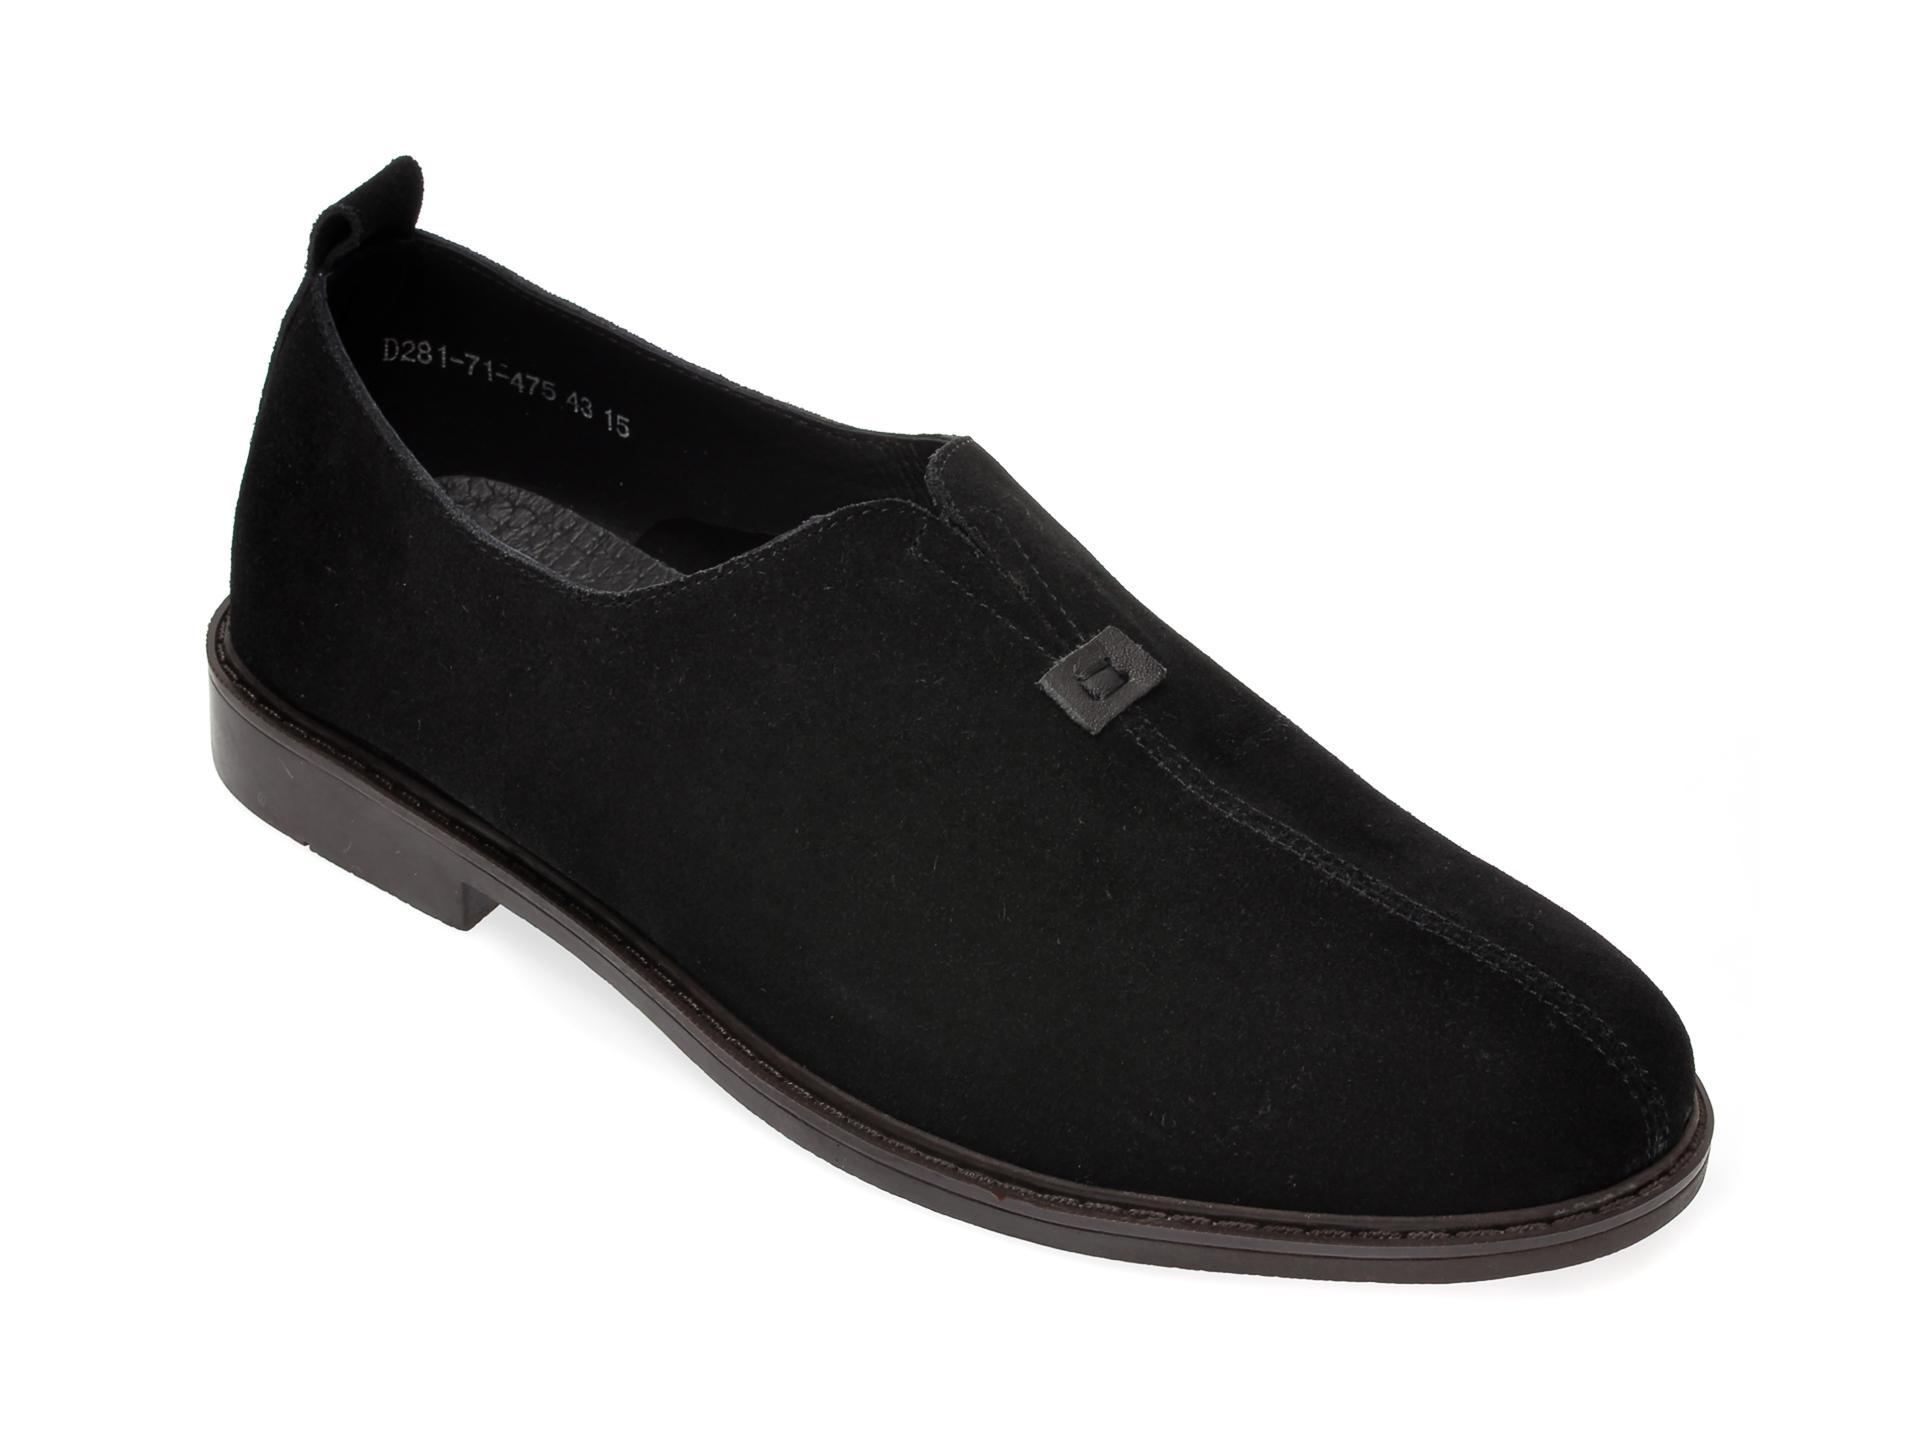 Pantofi OTTER negri, D281714, din piele intoarsa